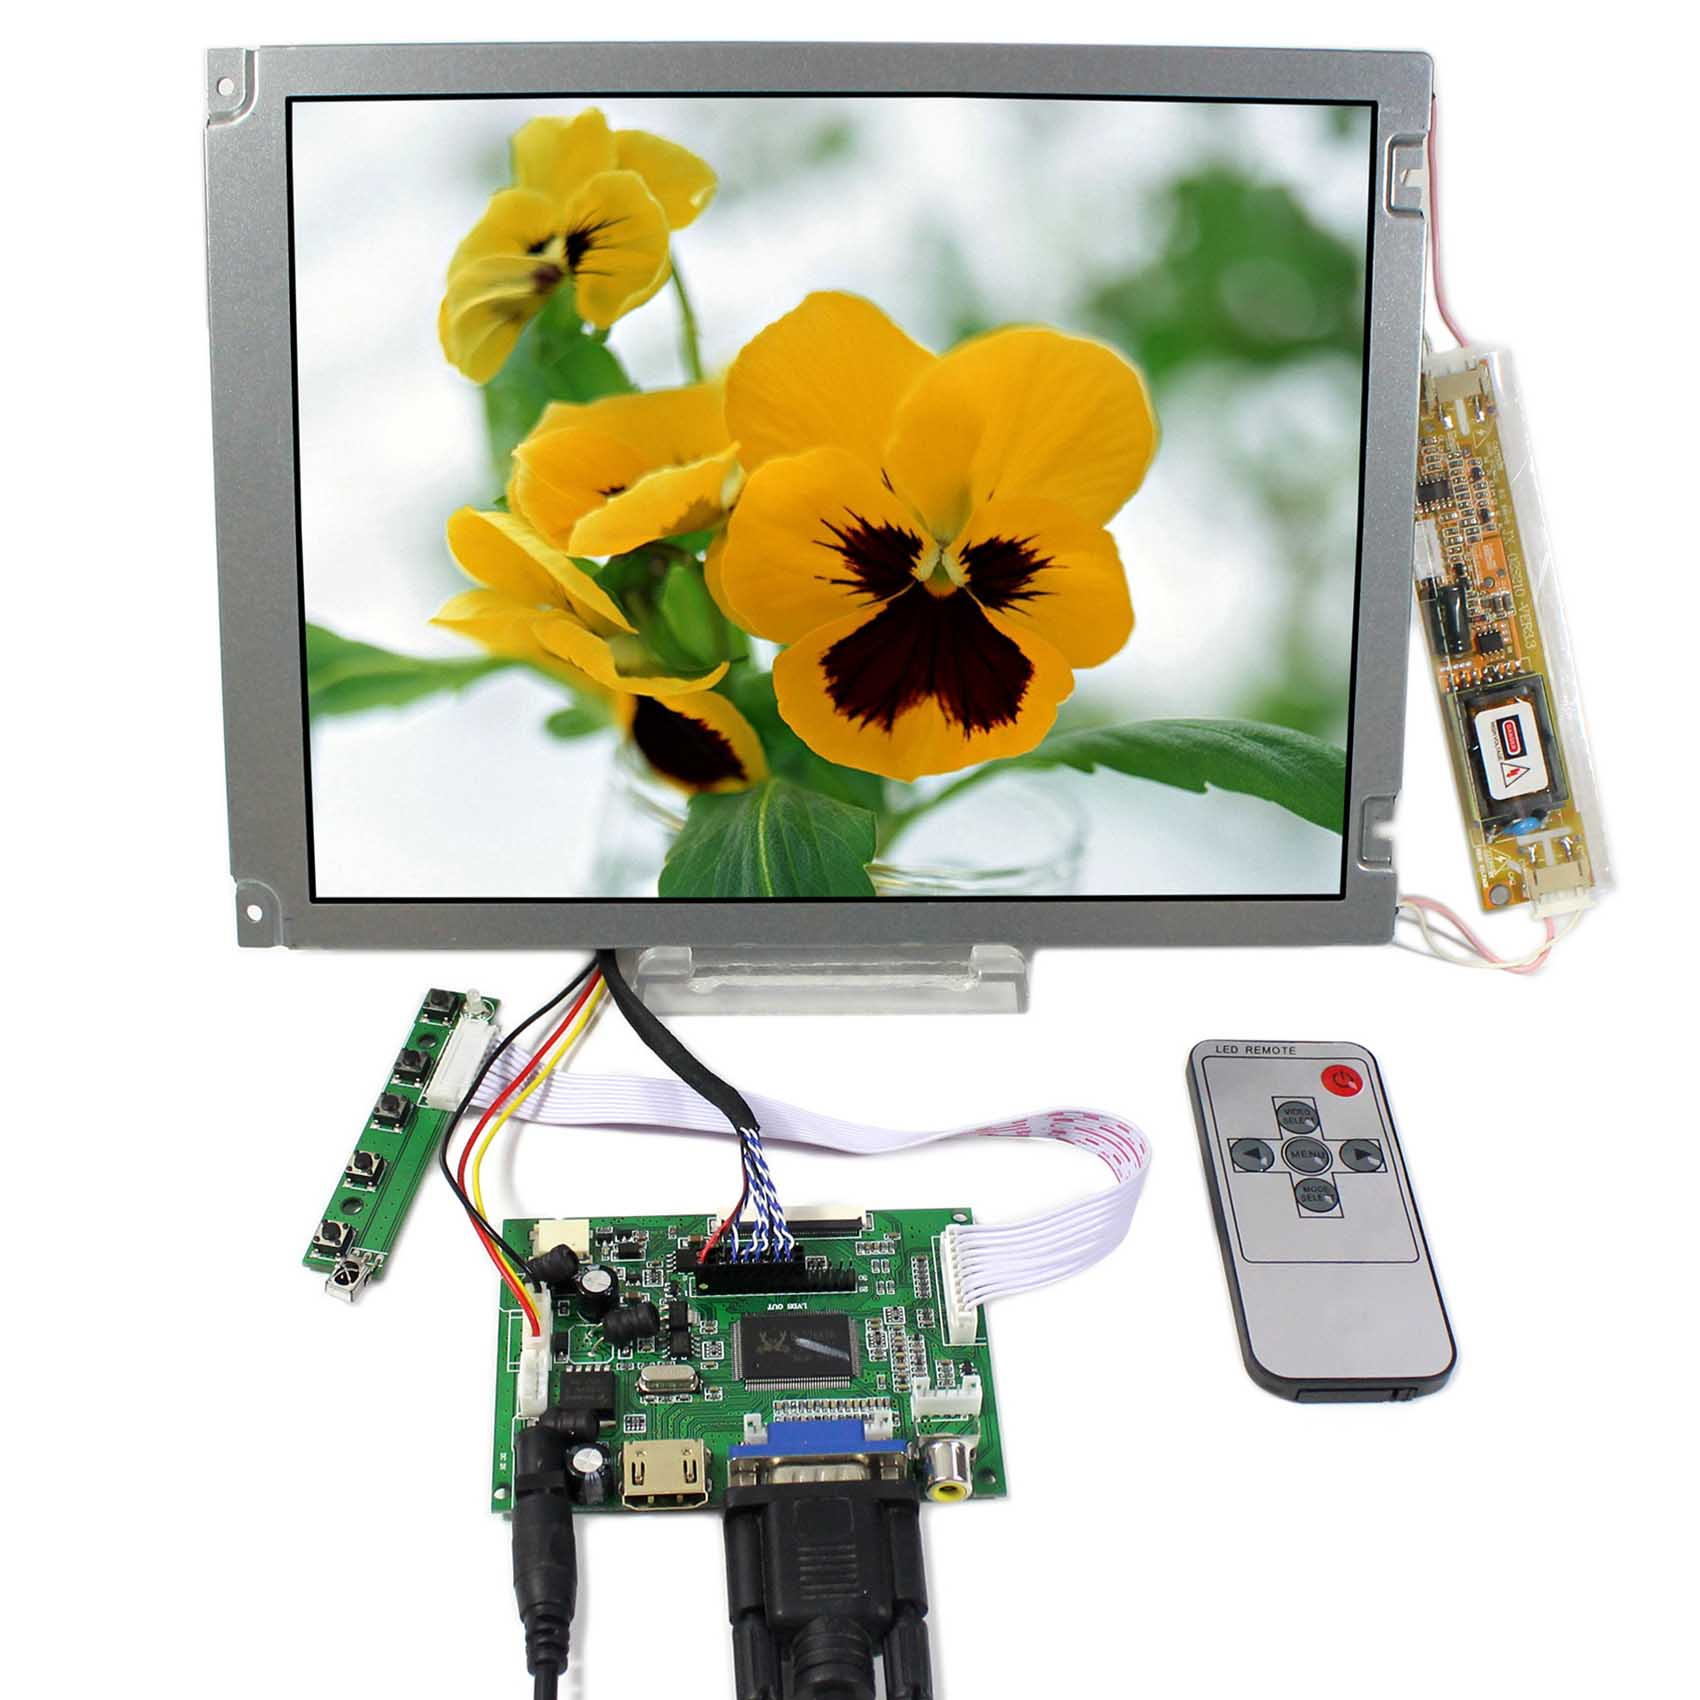 10.4inch AA104SG04 800x600 LCD Screen With HDMI VGA 2AV LCD LCD Controller Board VS-TY2662-V1 8inch zj080na 08a 1024x600 lcd screen vga 2av reversing lcd controller board kyv n2 v1